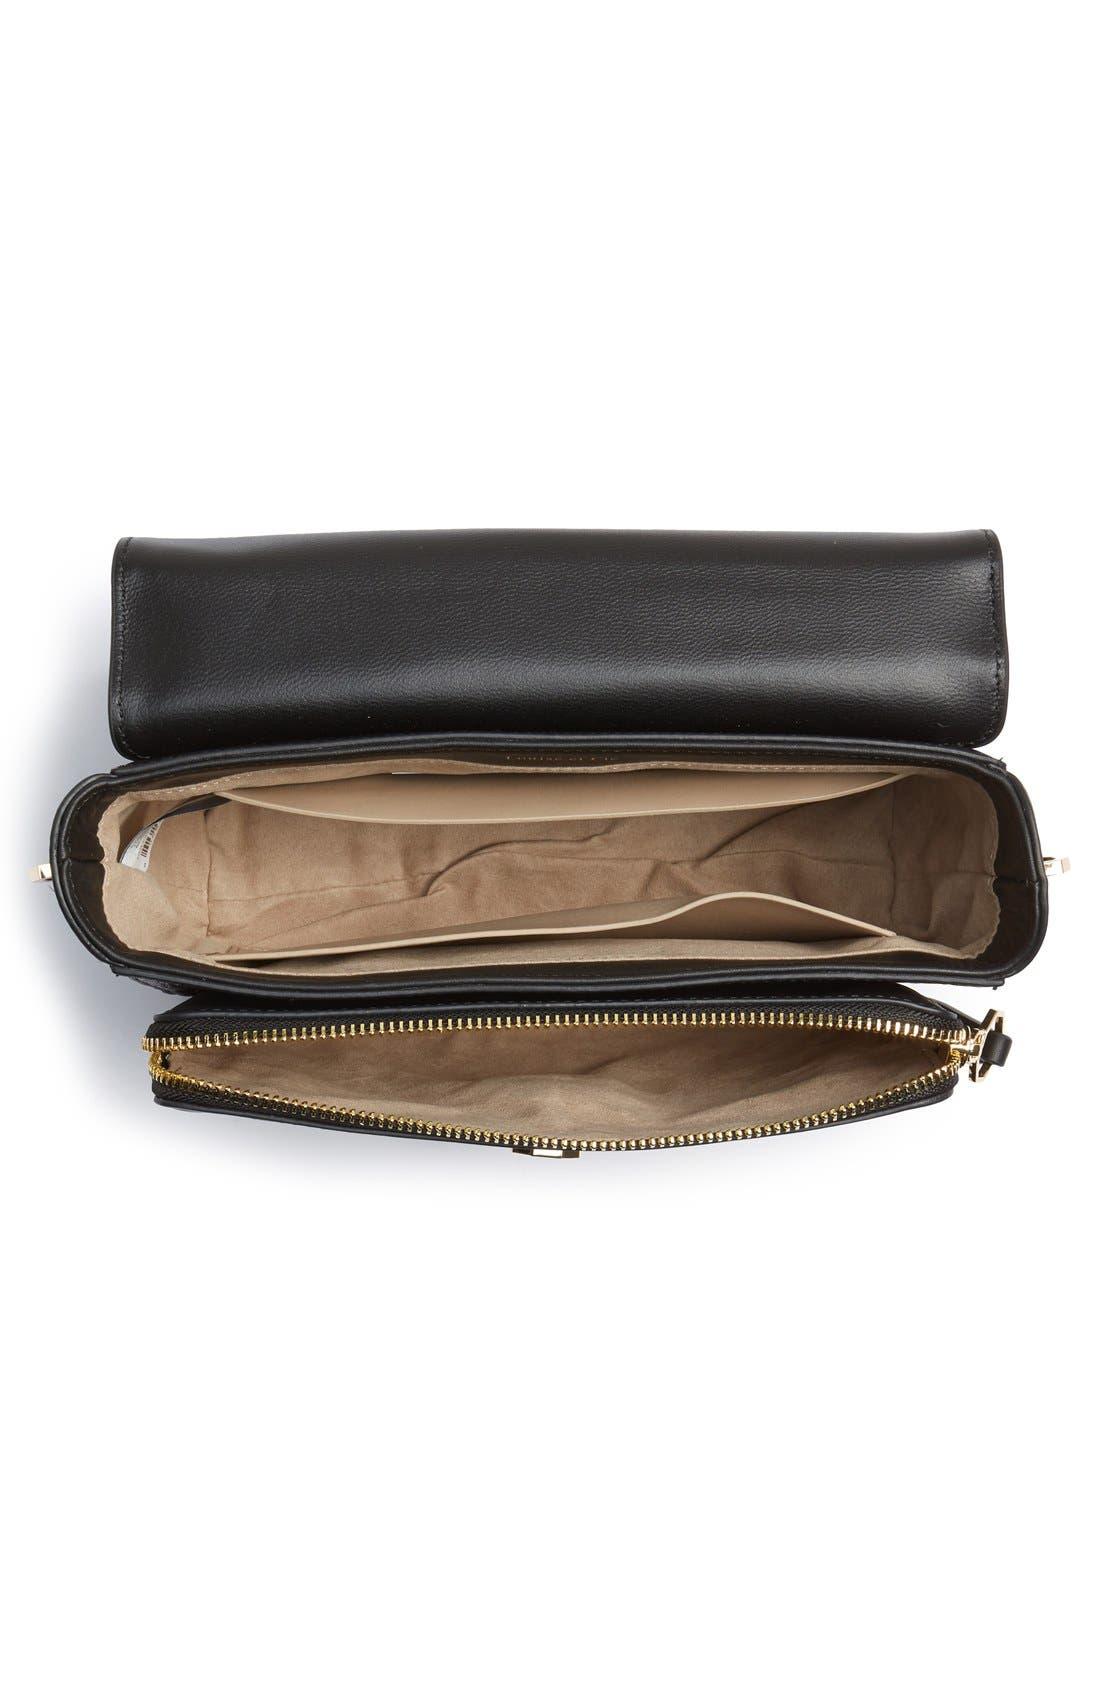 'Small Alis' Leather Crossbody Bag,                             Alternate thumbnail 6, color,                             001